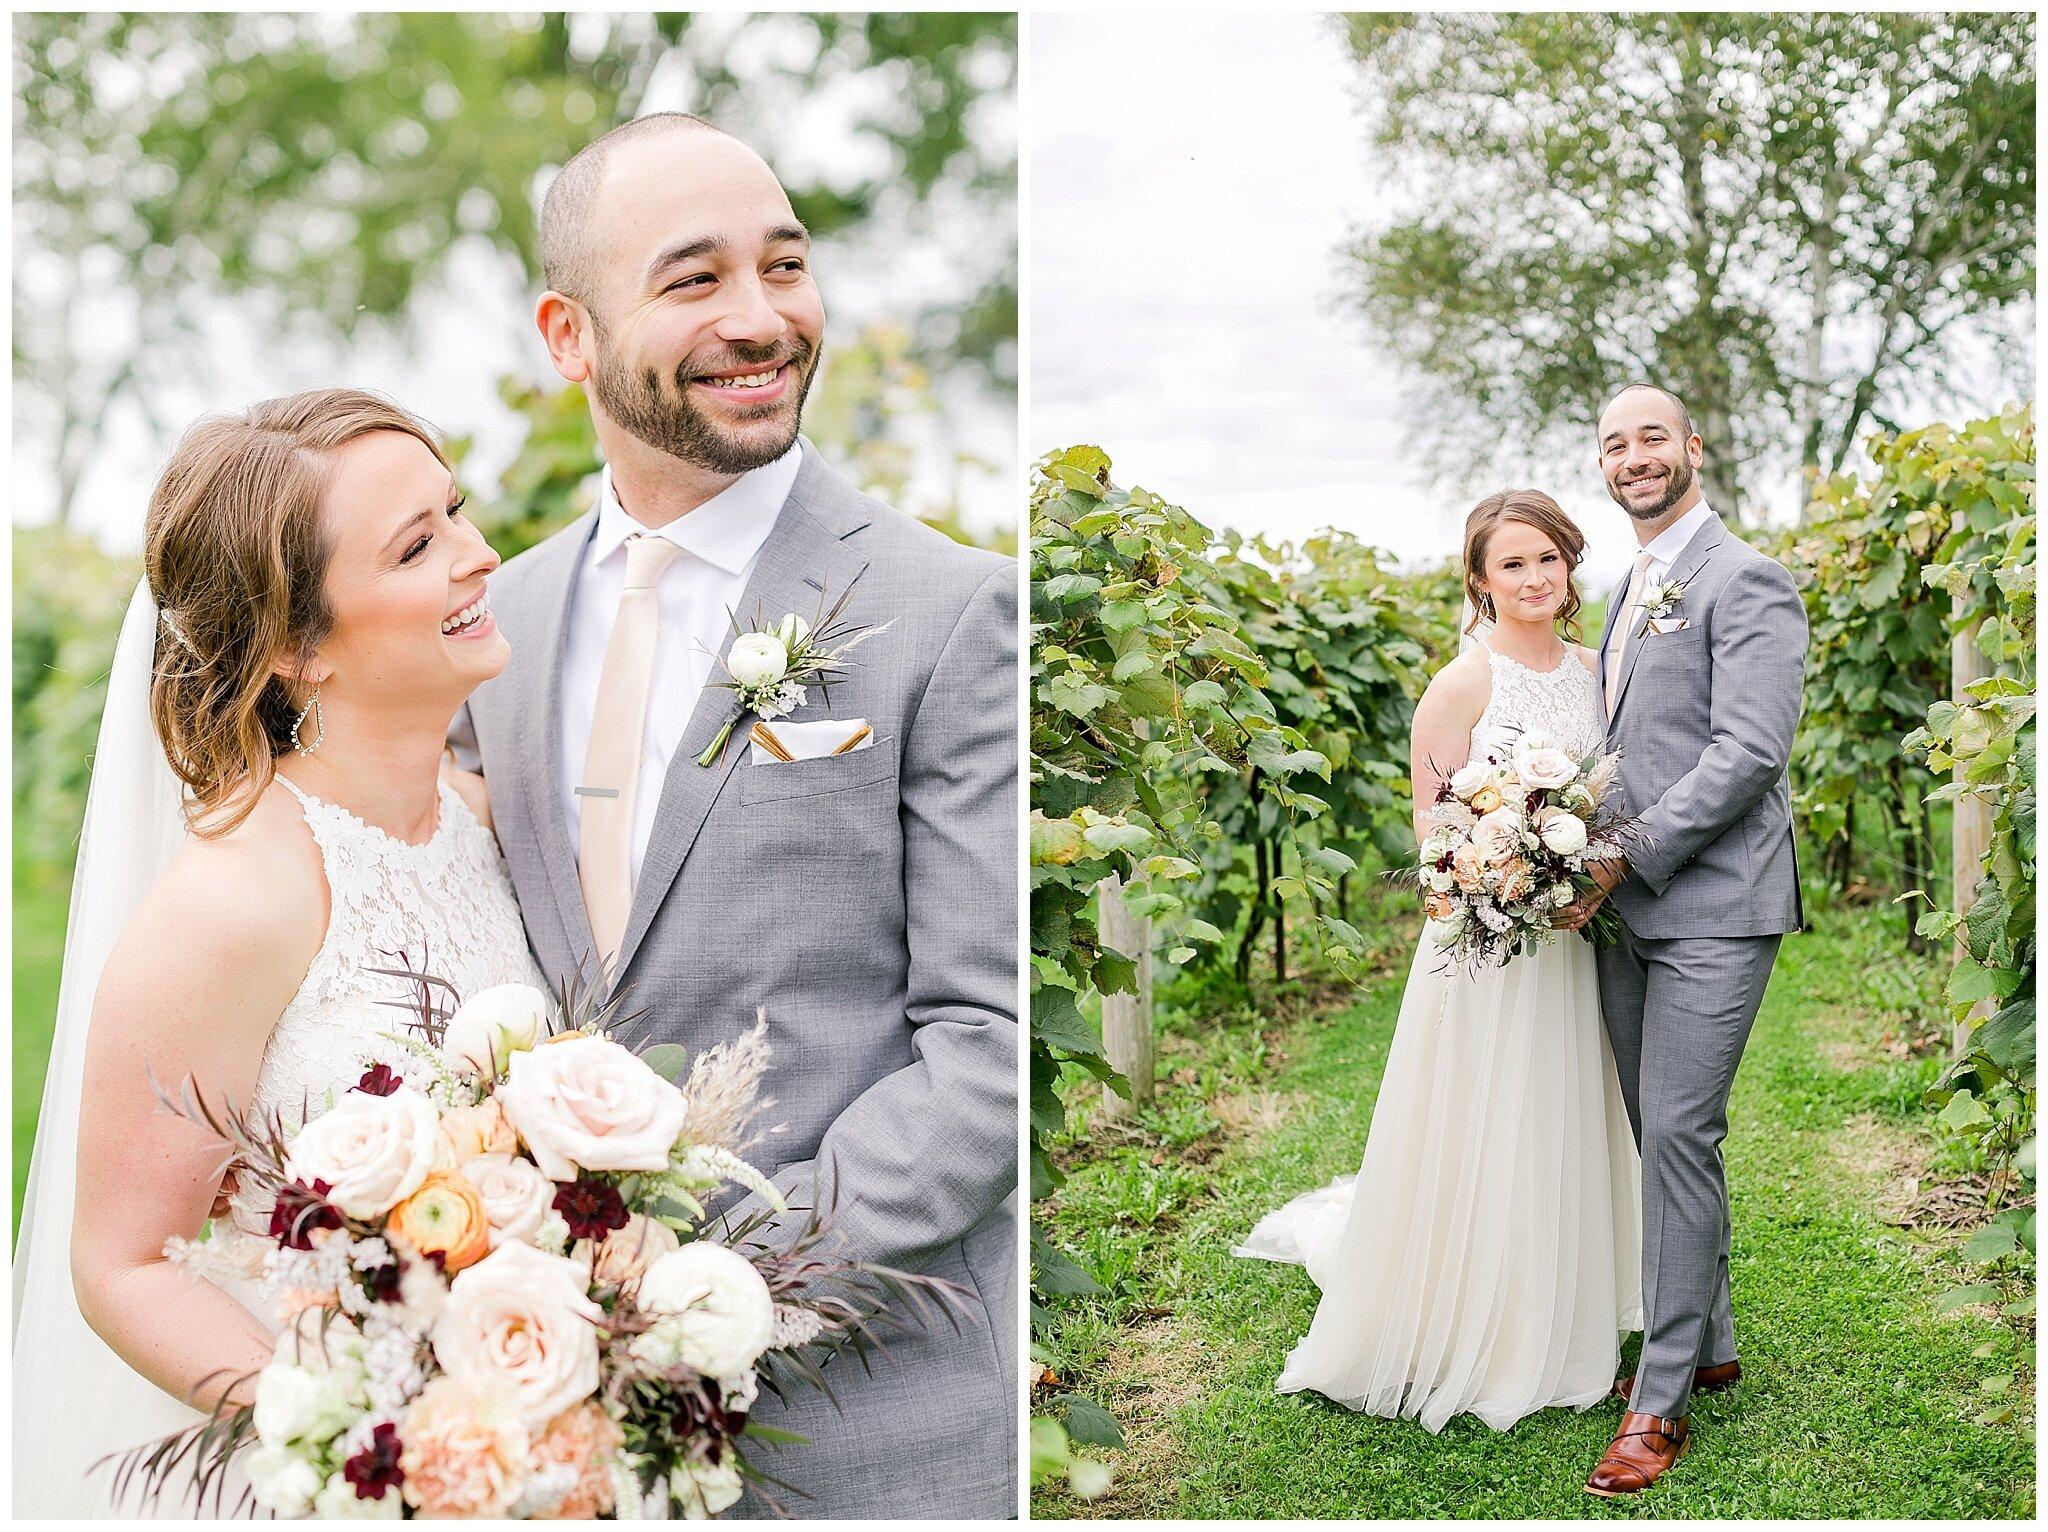 over_the_vines_edgerton_wisconsin_wedding_madison_wisconsin_photographer_0436.jpg